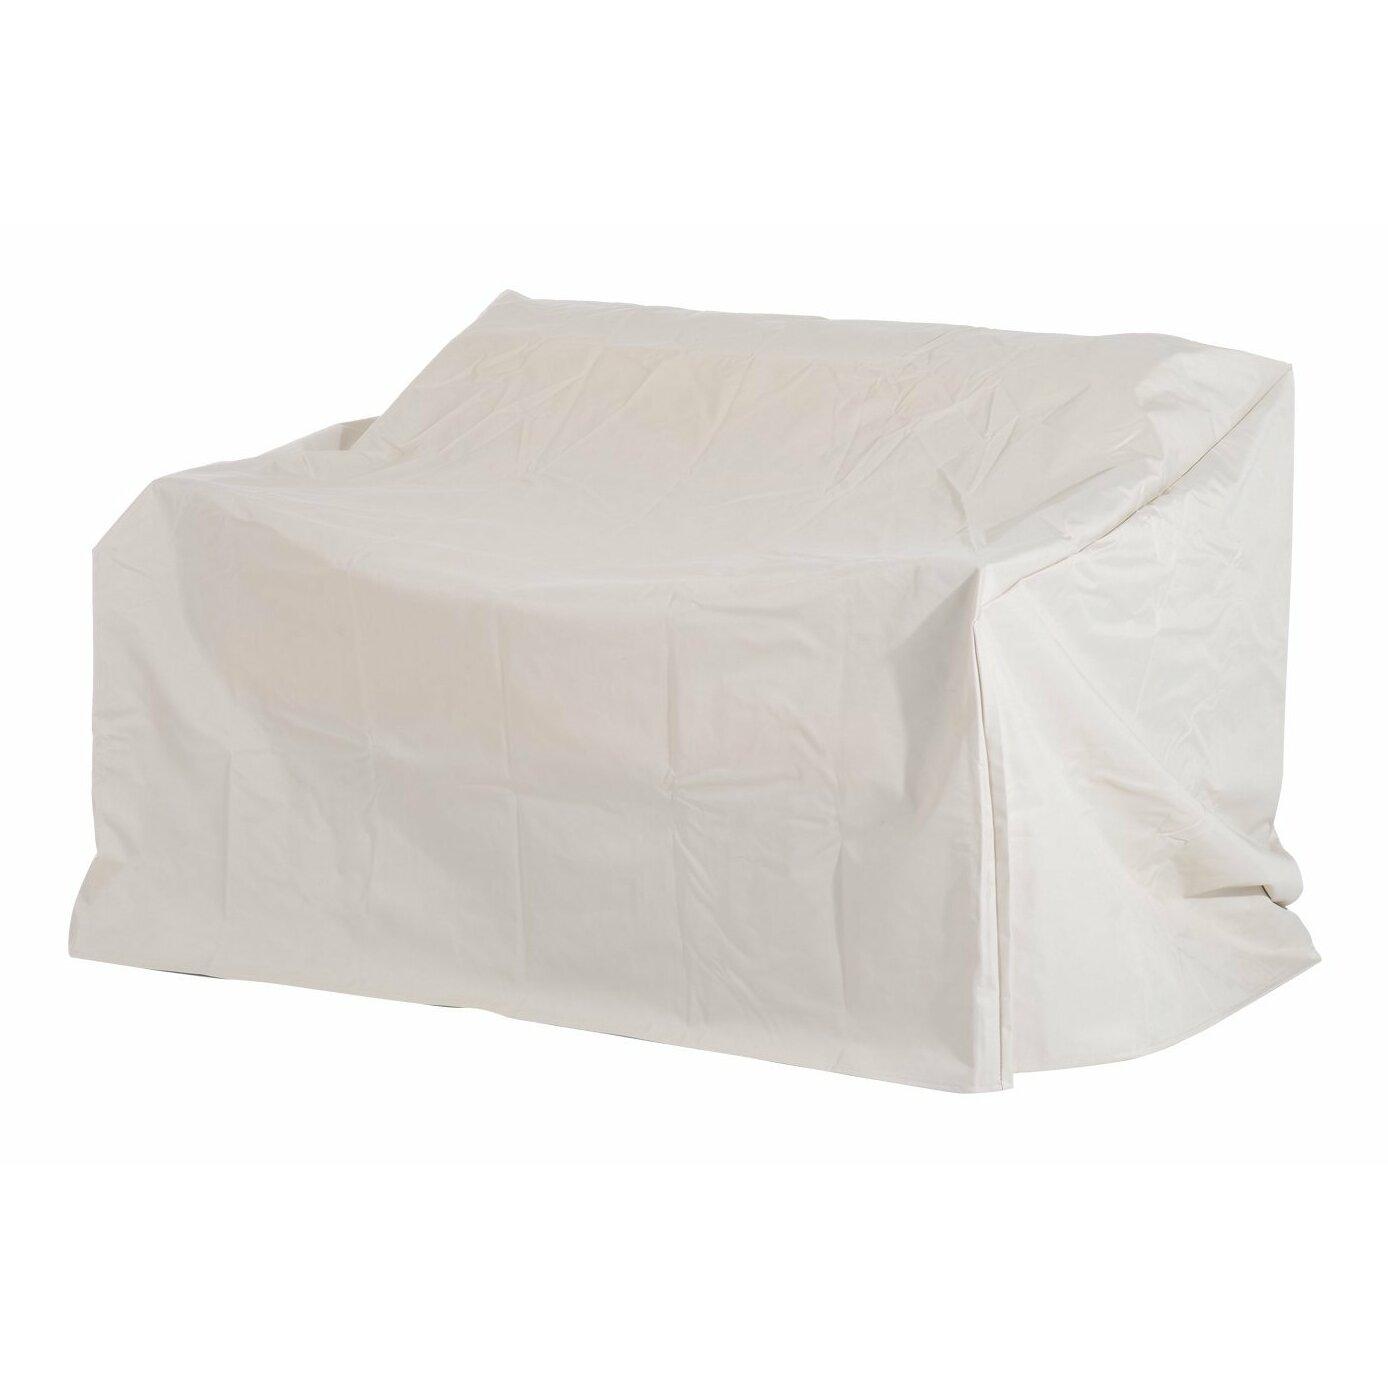 outsunny sofa cover wayfair uk. Black Bedroom Furniture Sets. Home Design Ideas